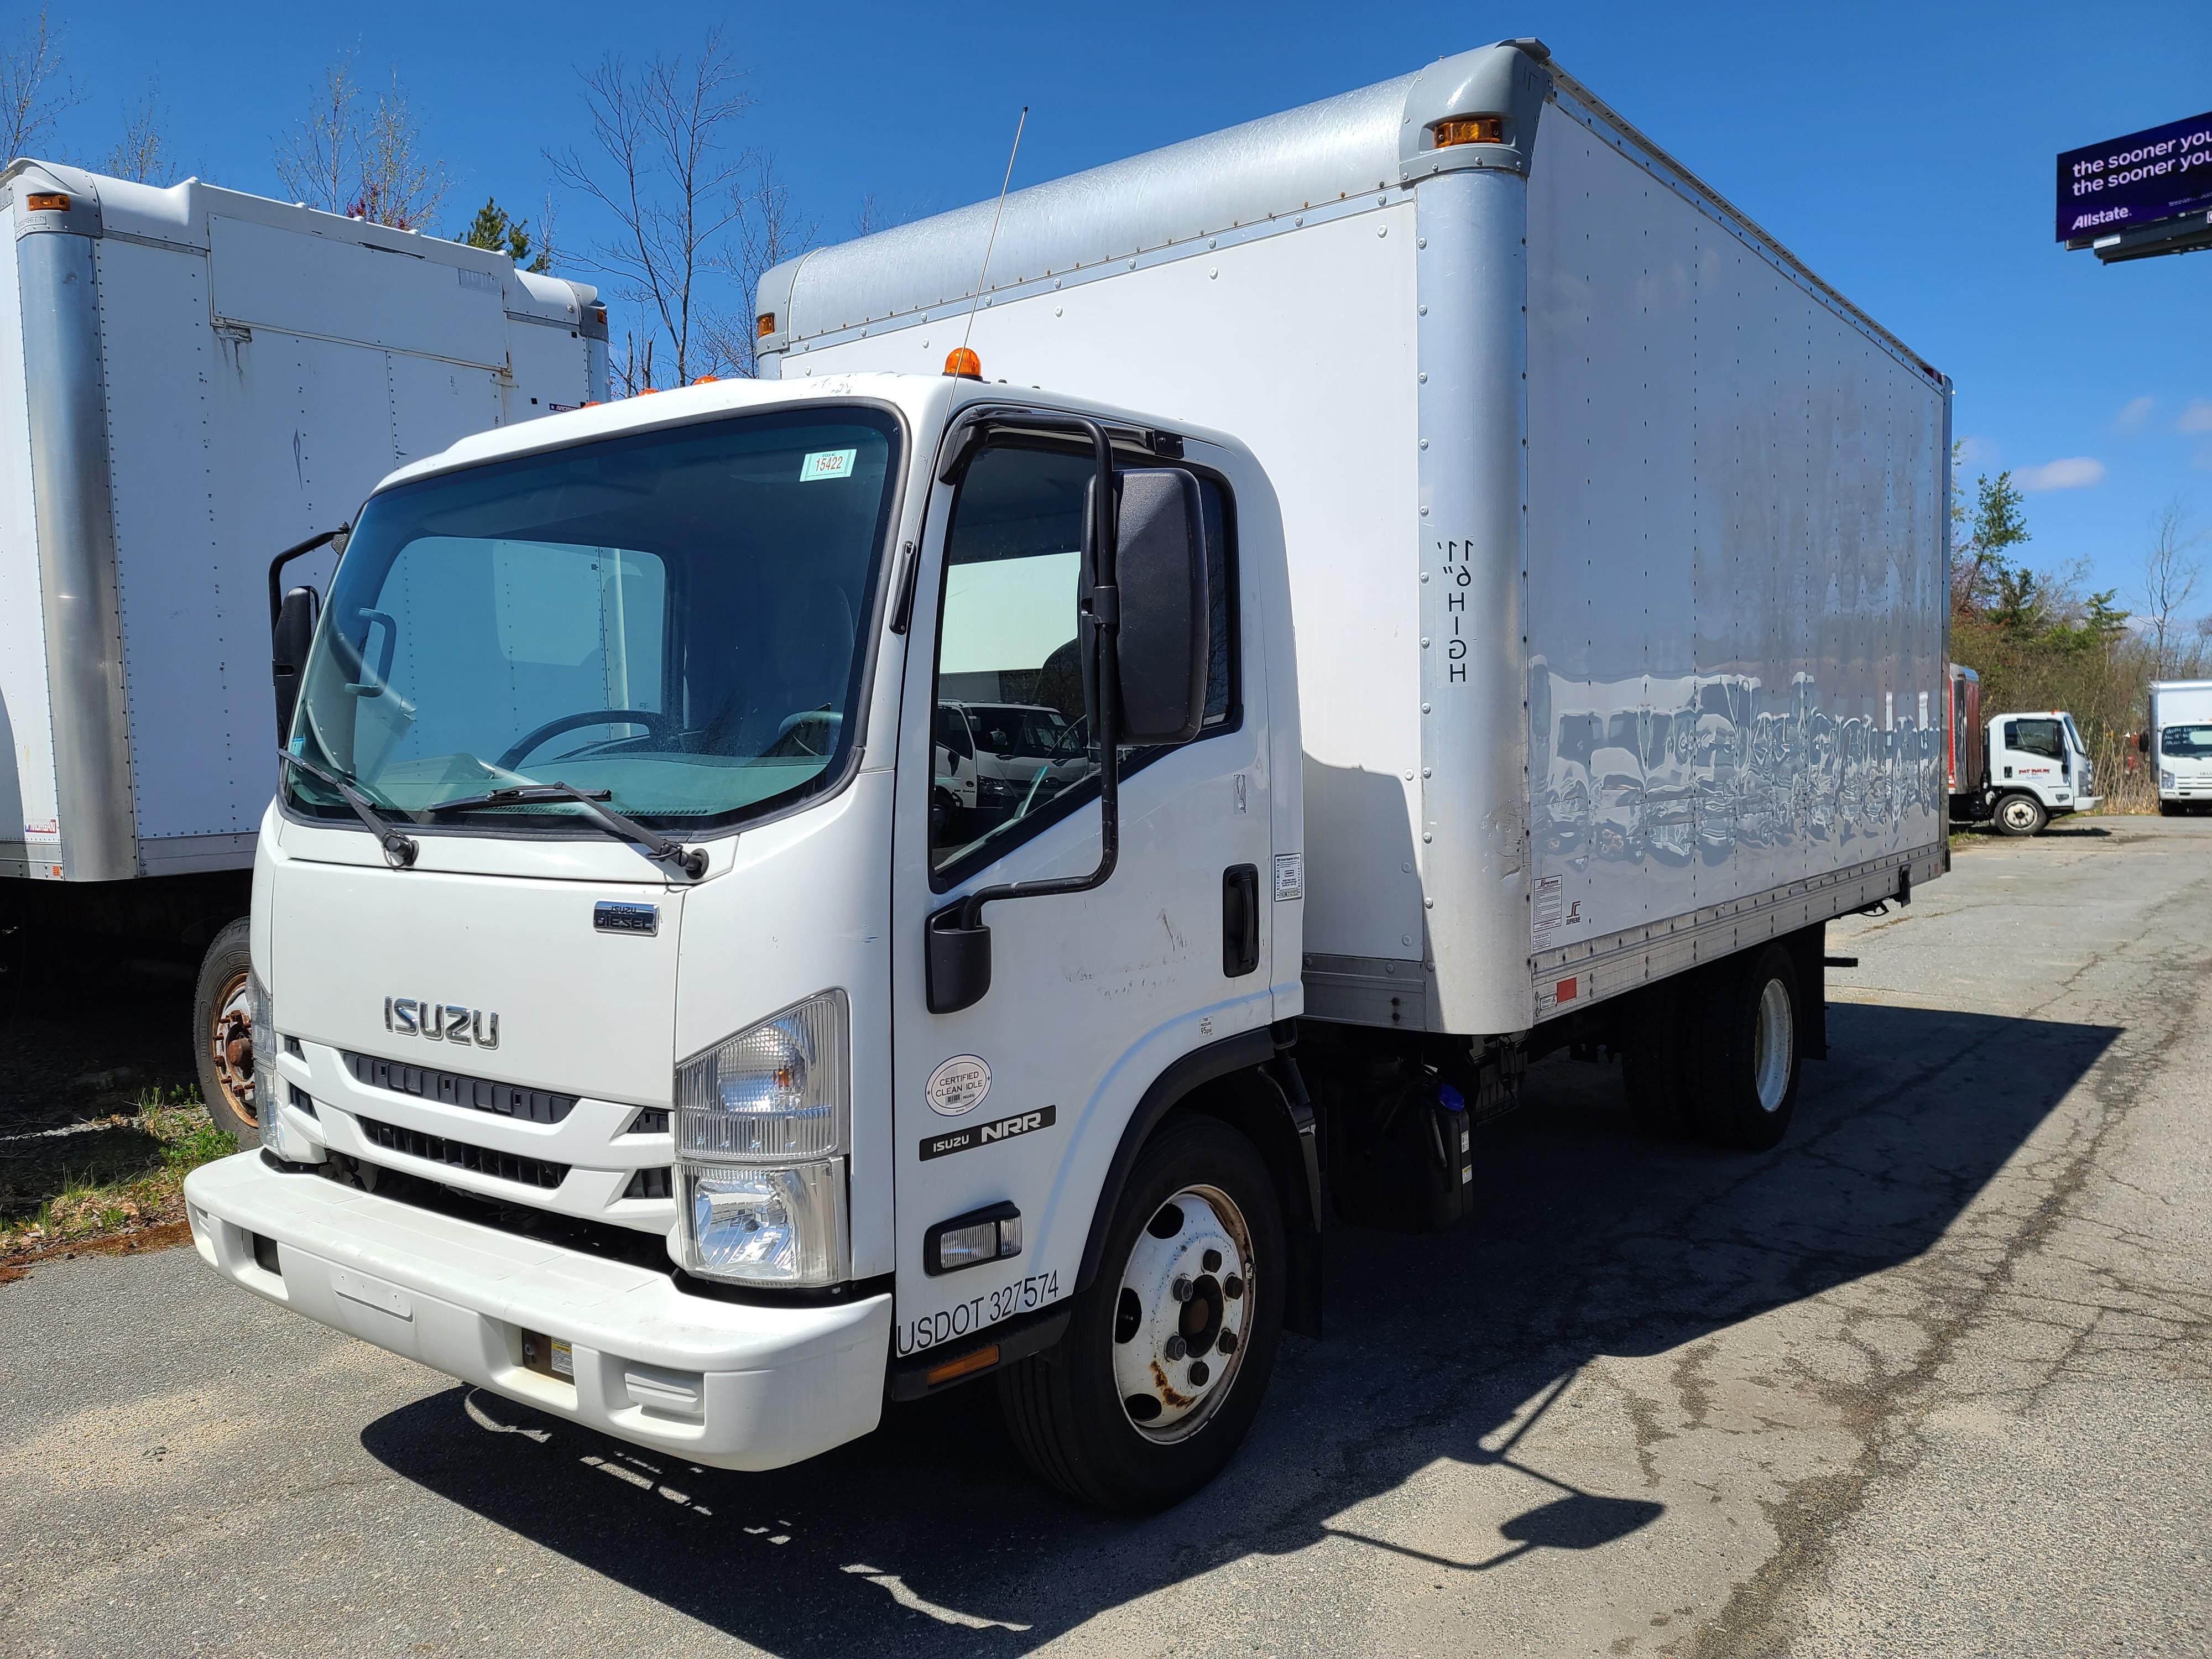 Used, 2016, Isuzu, NRR, Cab / Chassis Trucks